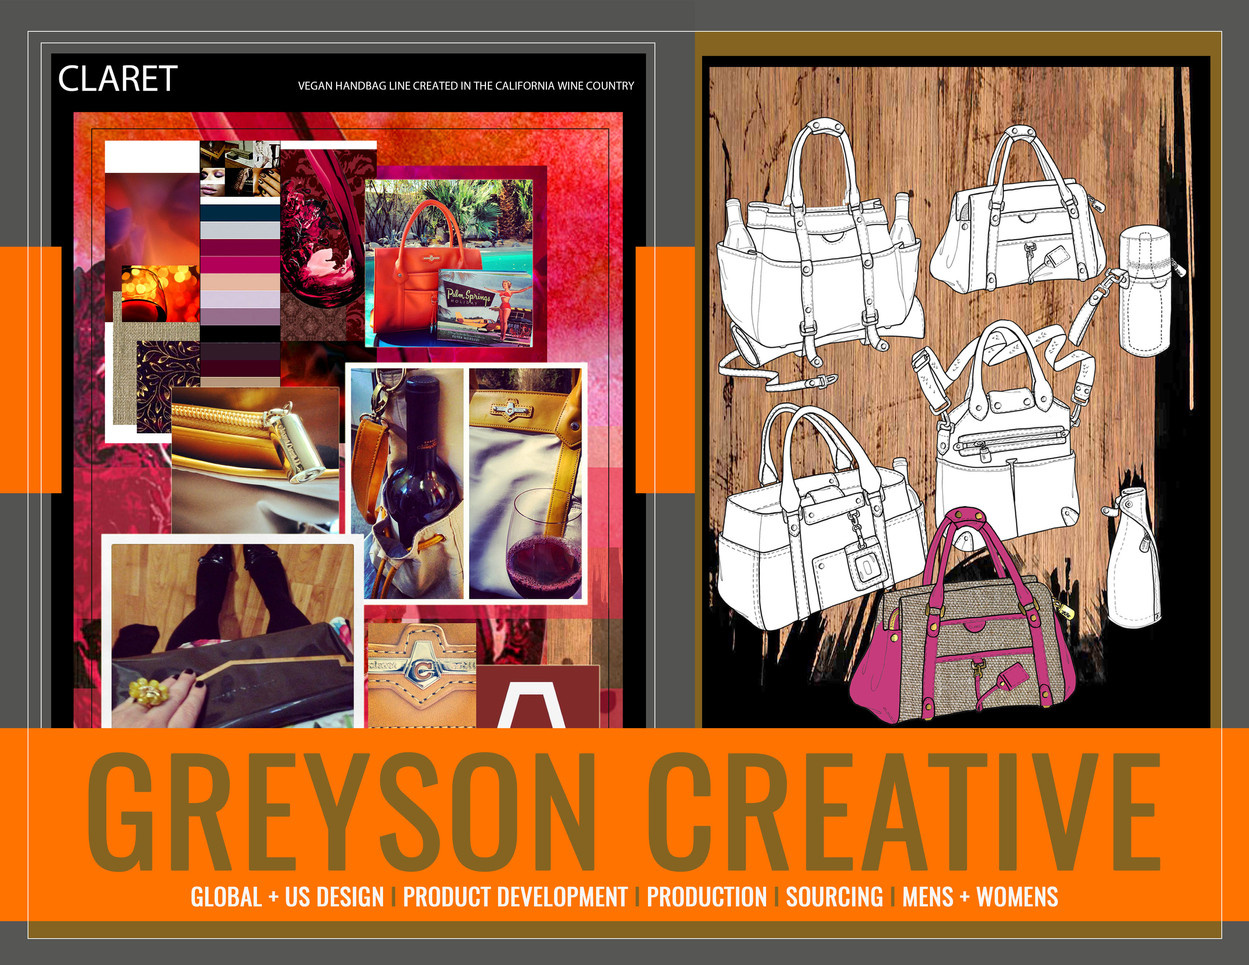 CLARET: Greyson Creative by Lukas Greyson